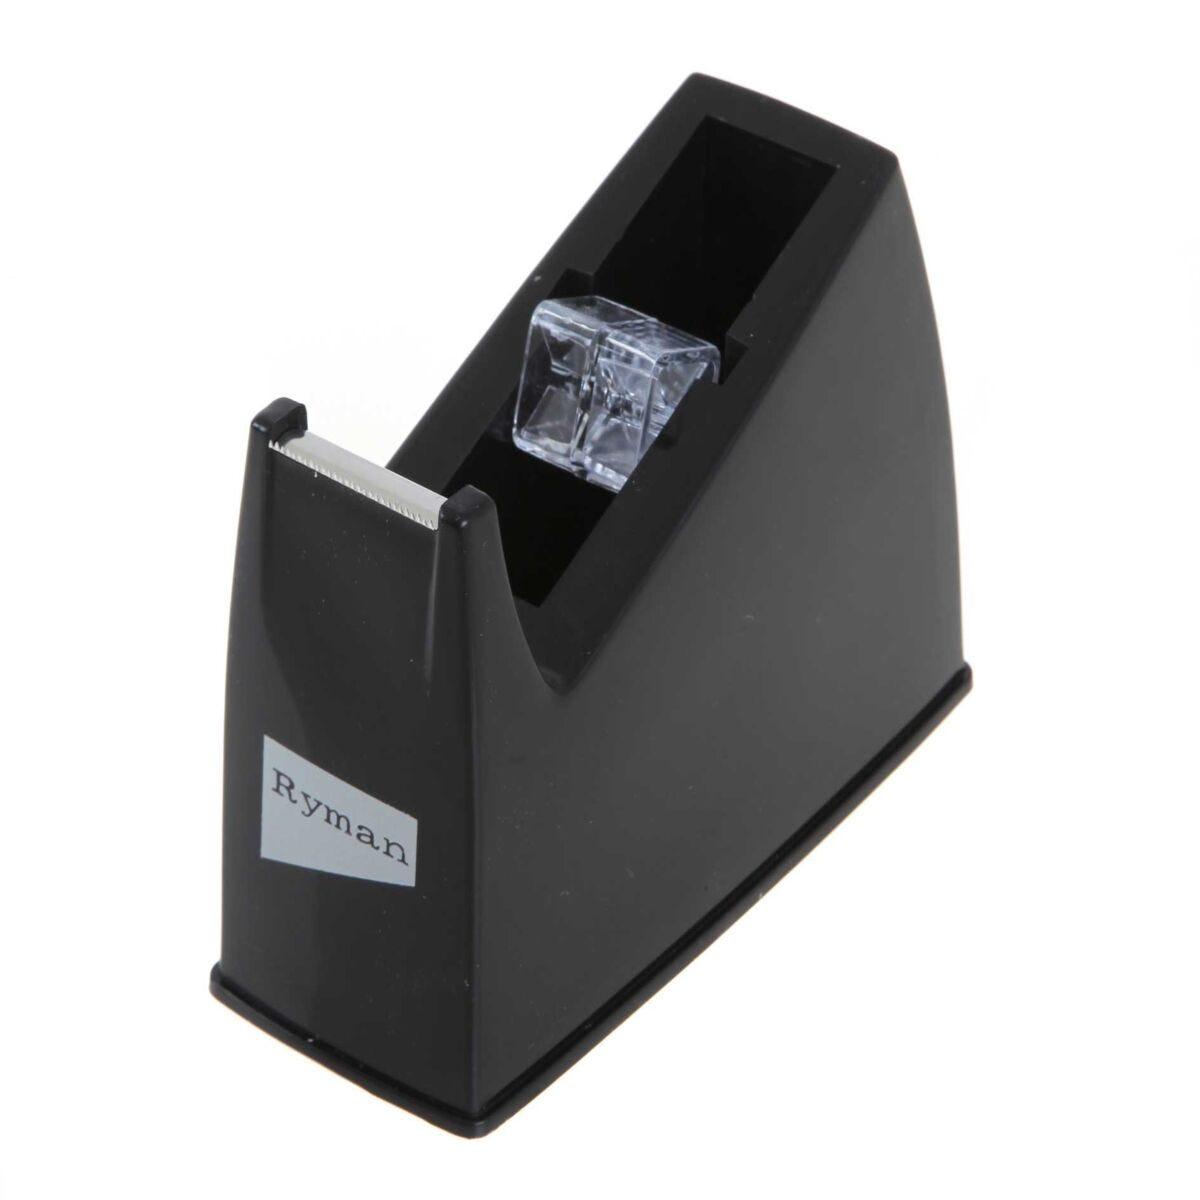 Ryman Tape Dispenser Medium